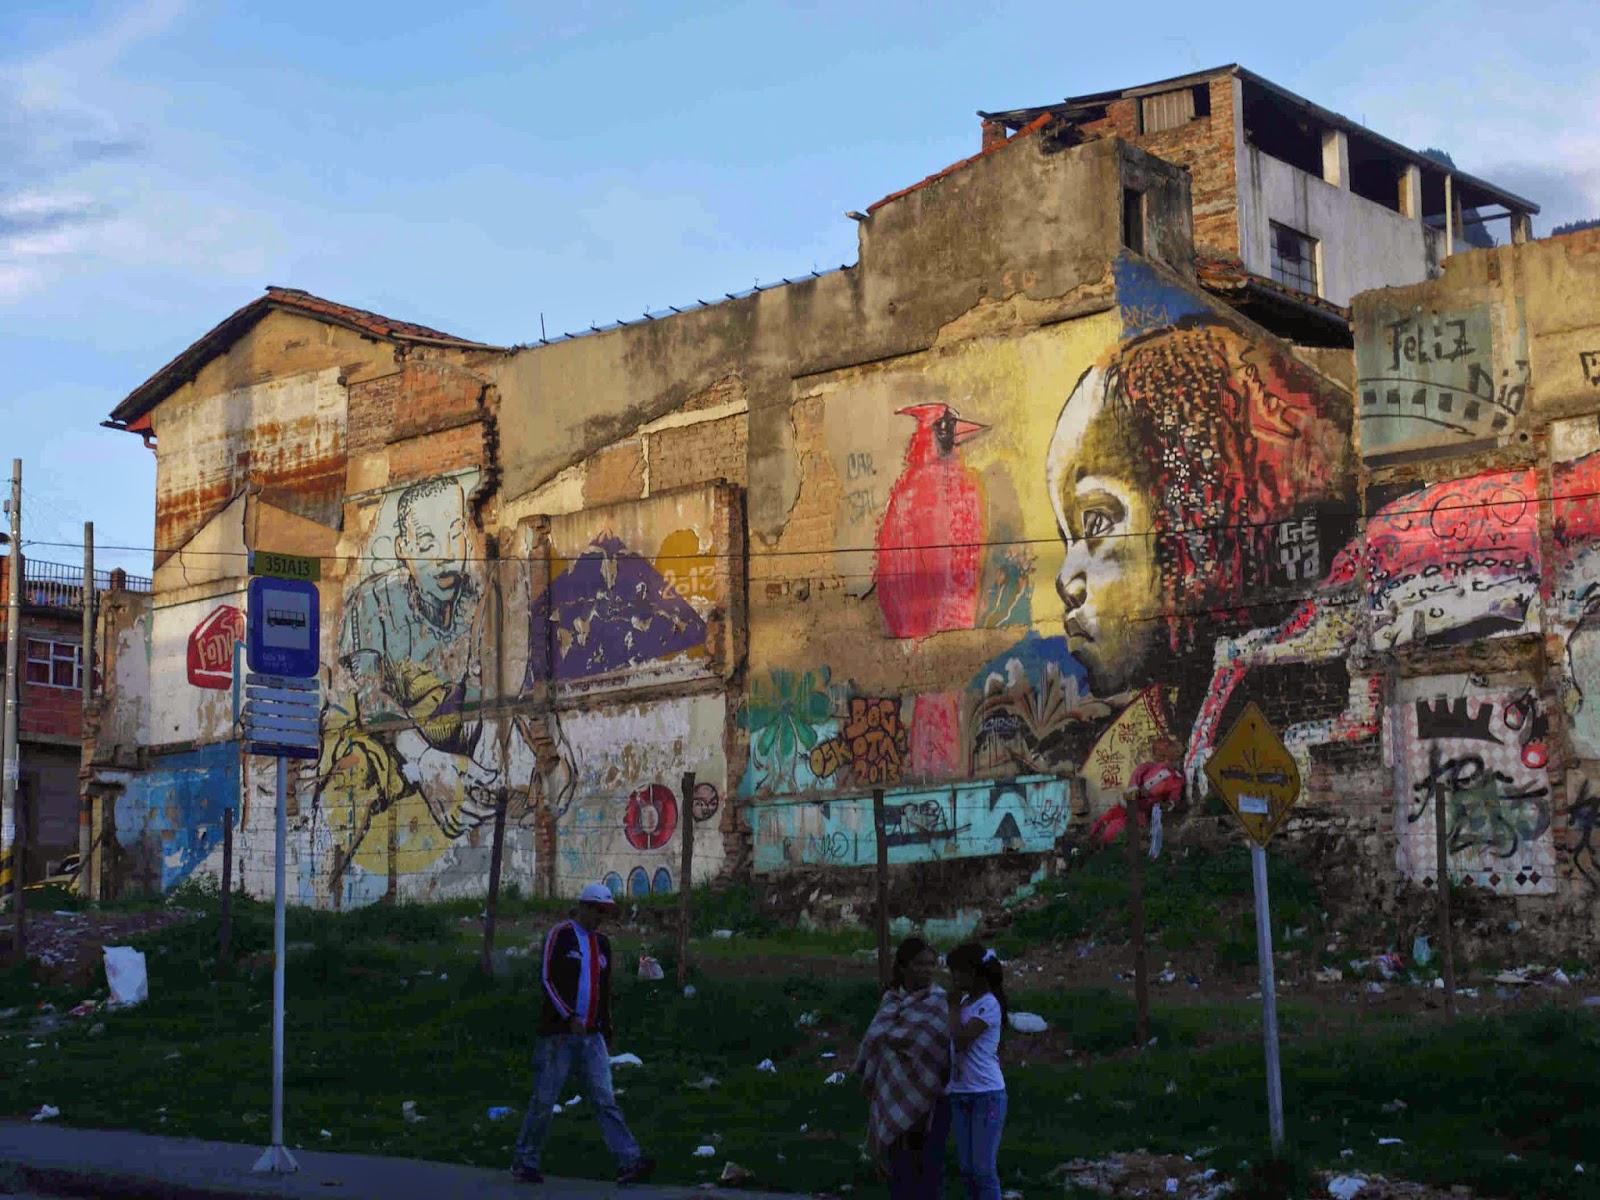 Mike 39 s bogota blog skating and biking in barrio egipto for Mural egipcio